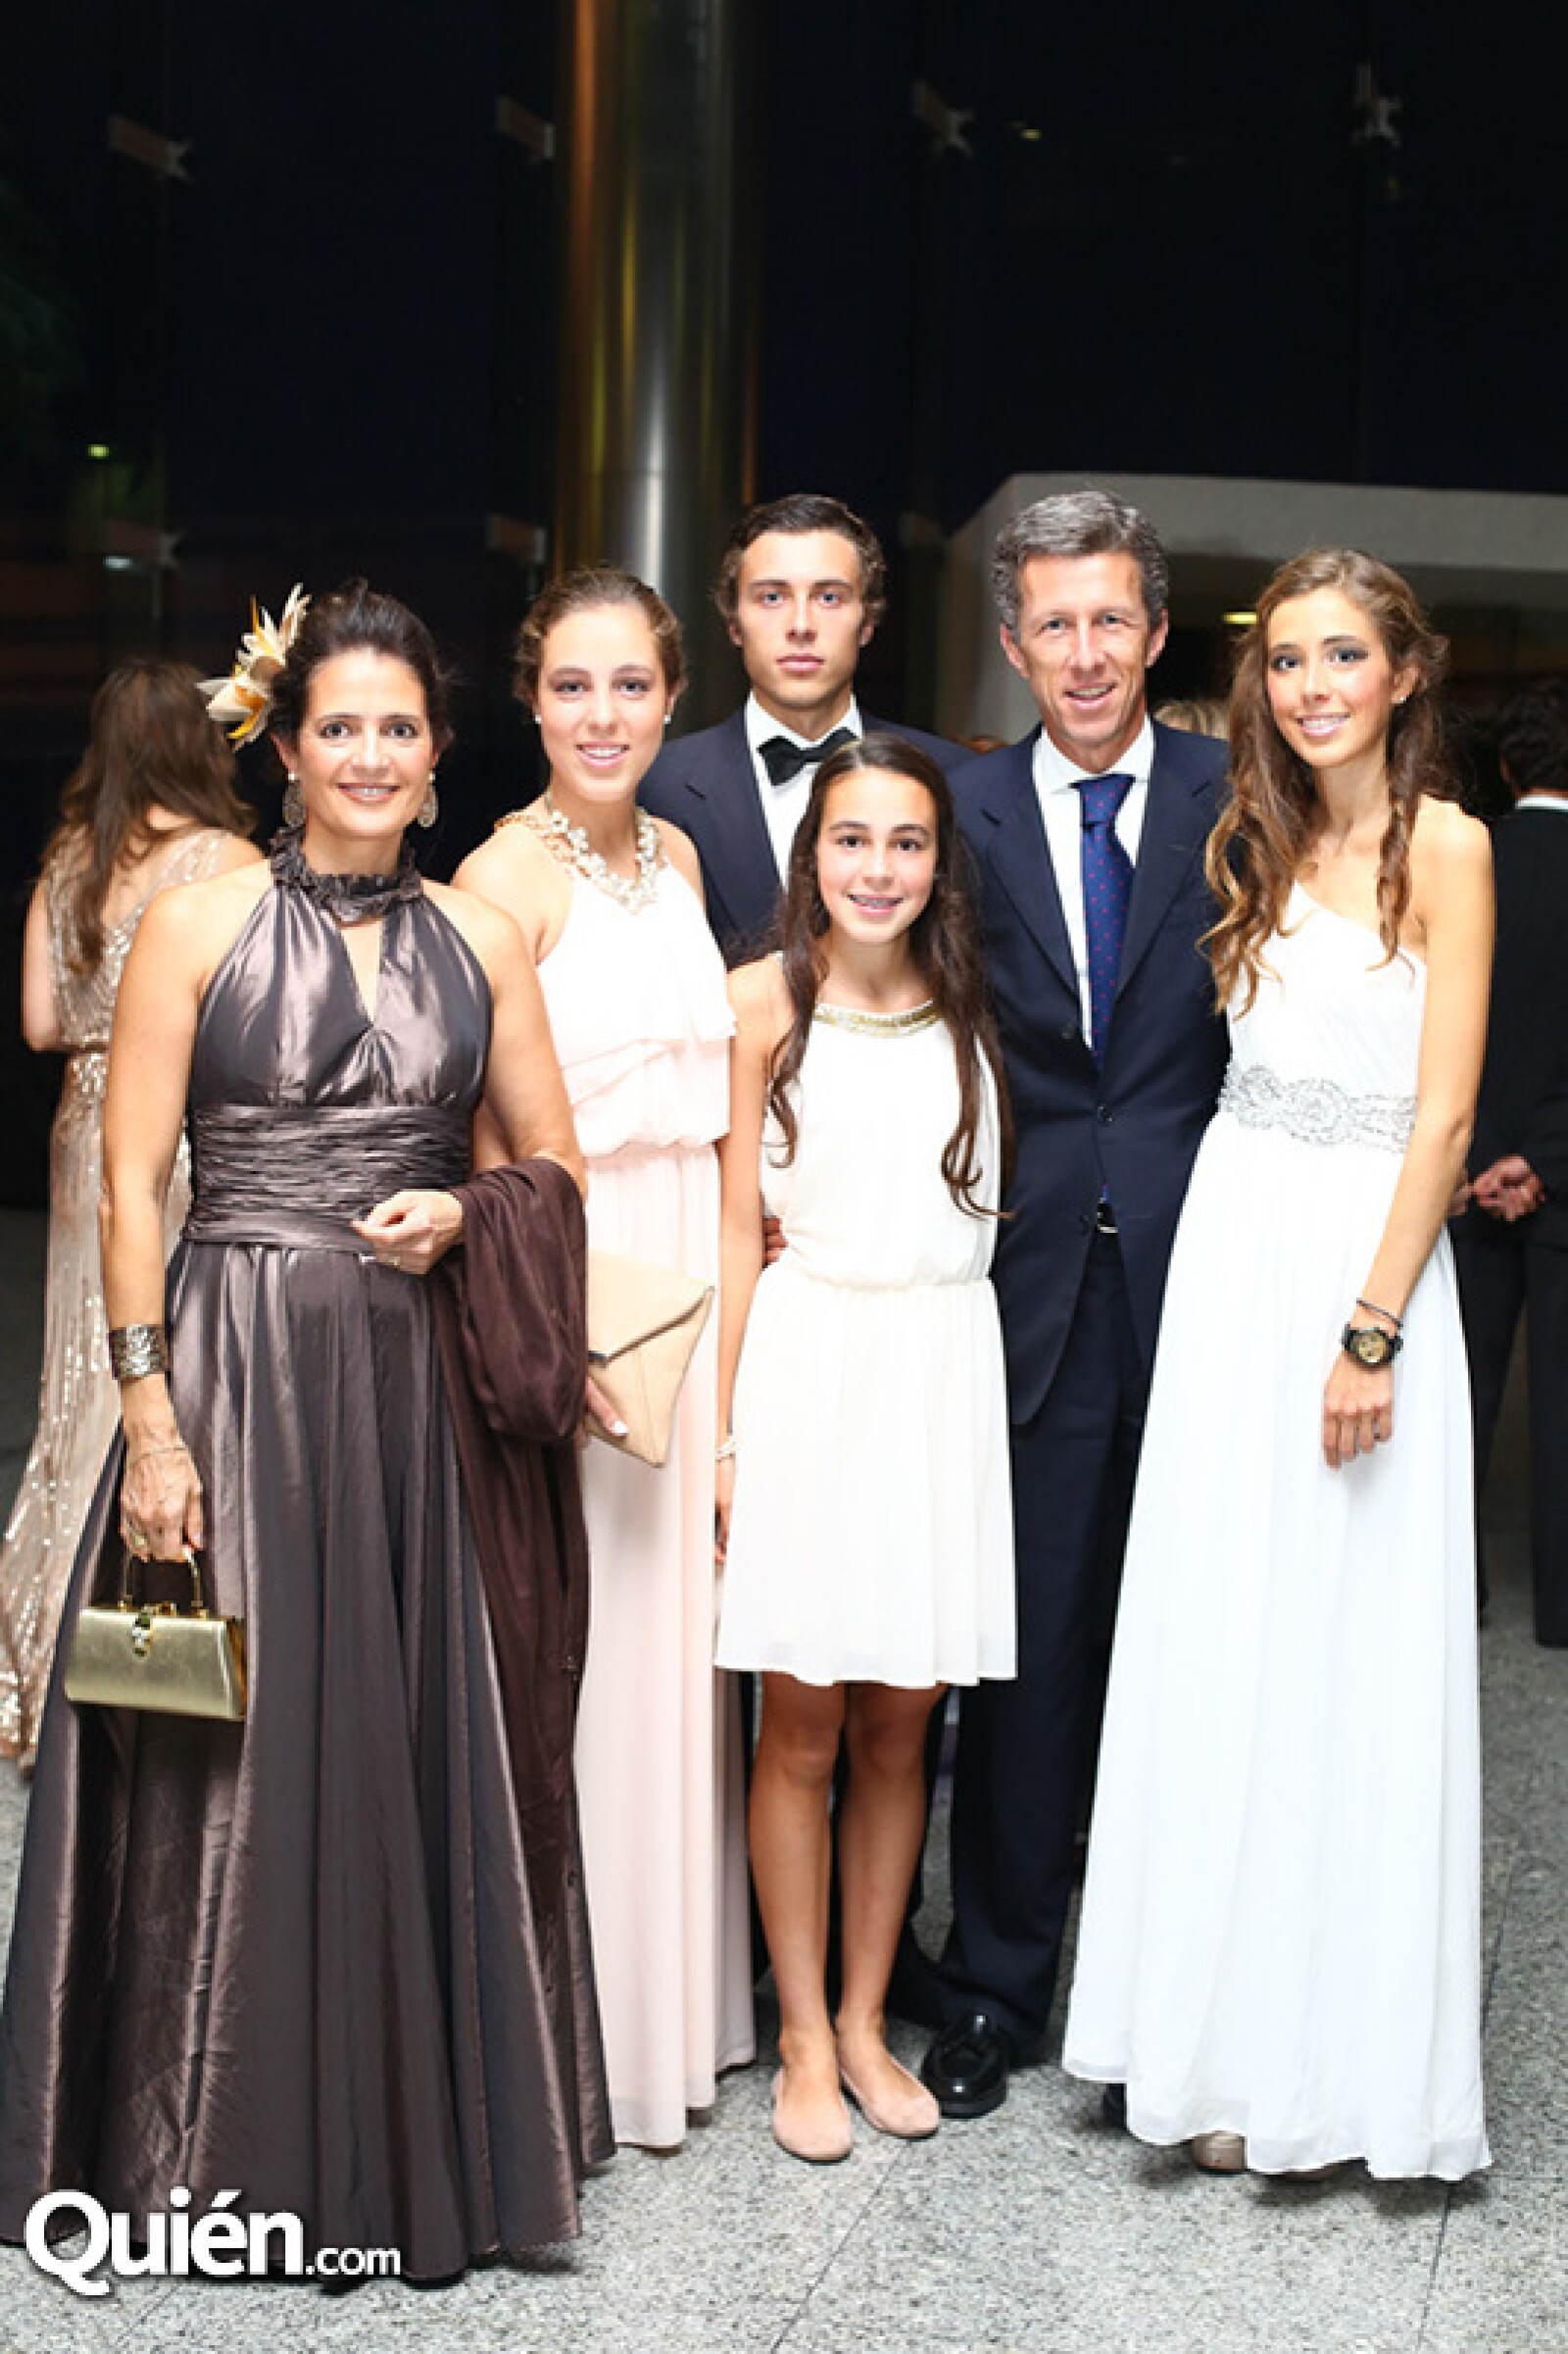 Charito Alverde, Mirén, José, Lorea, José e Irantzu Agüinaga